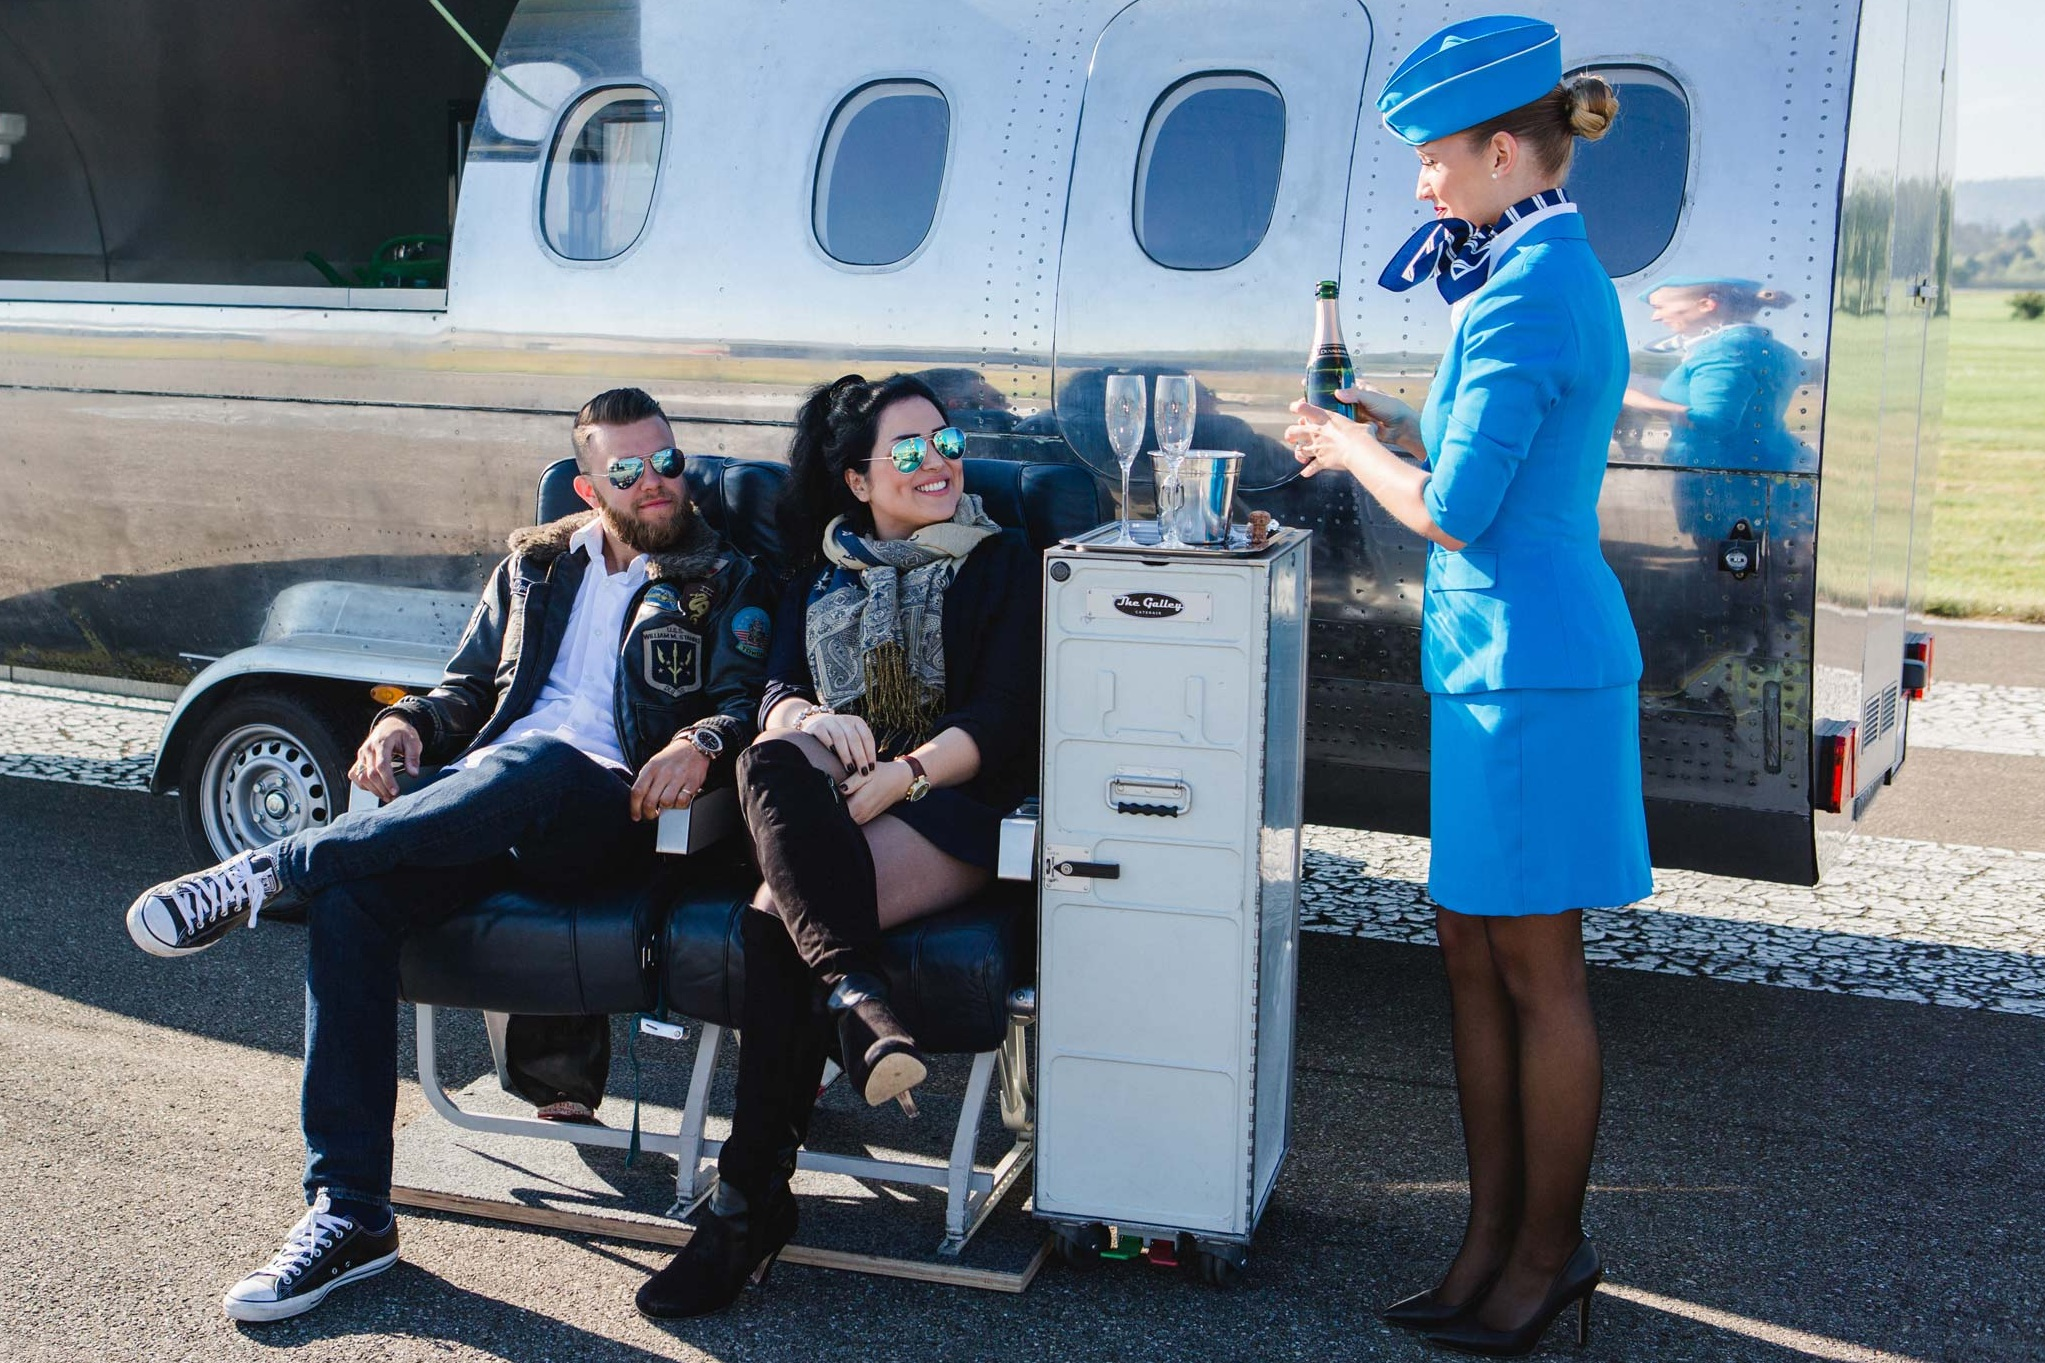 the-galley-rentals-aircraft-seats.jpg